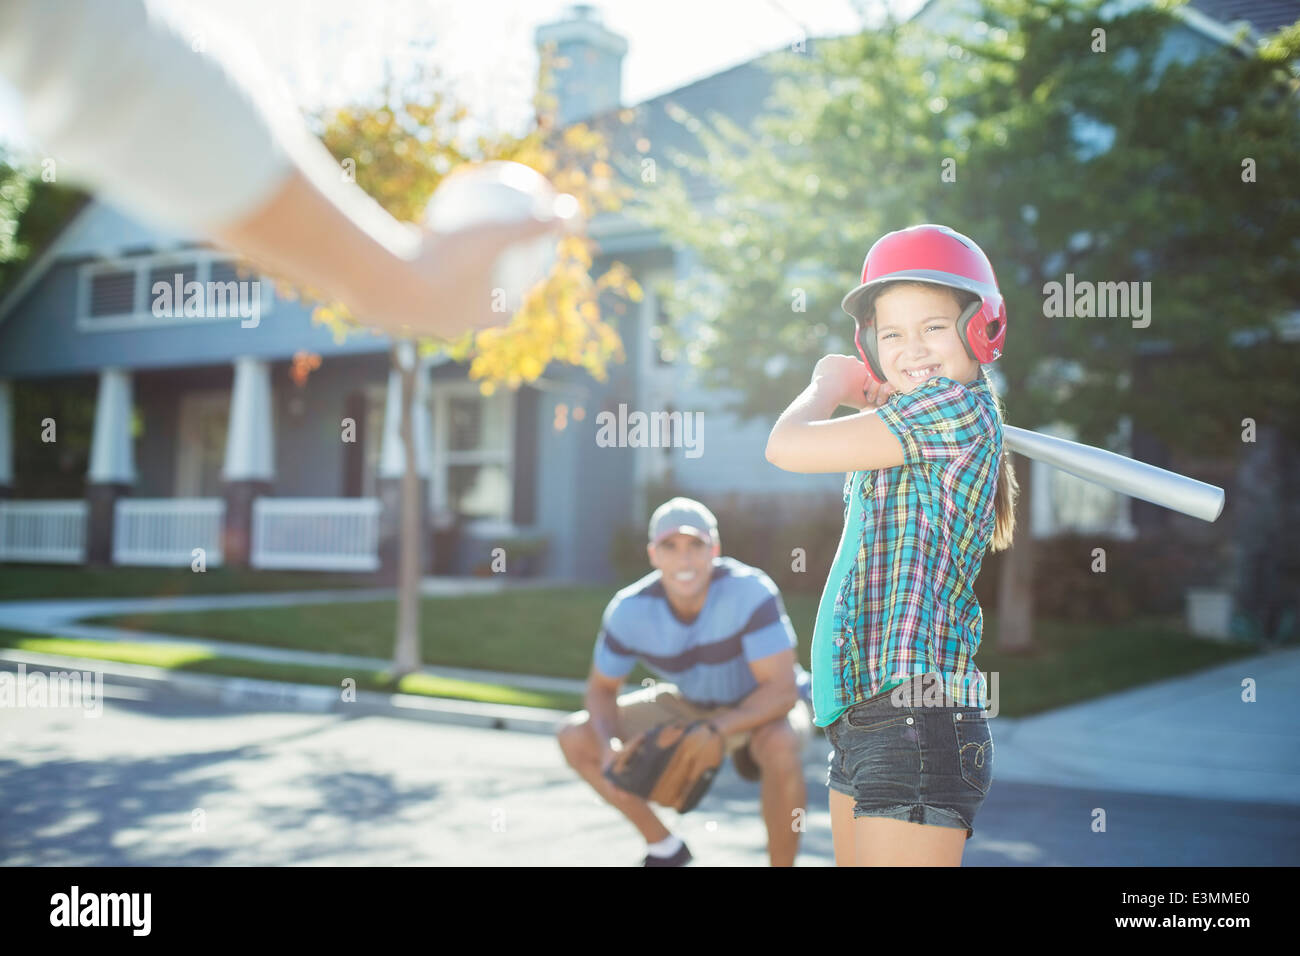 Familie Baseball zu spielen, in der Straße Stockbild